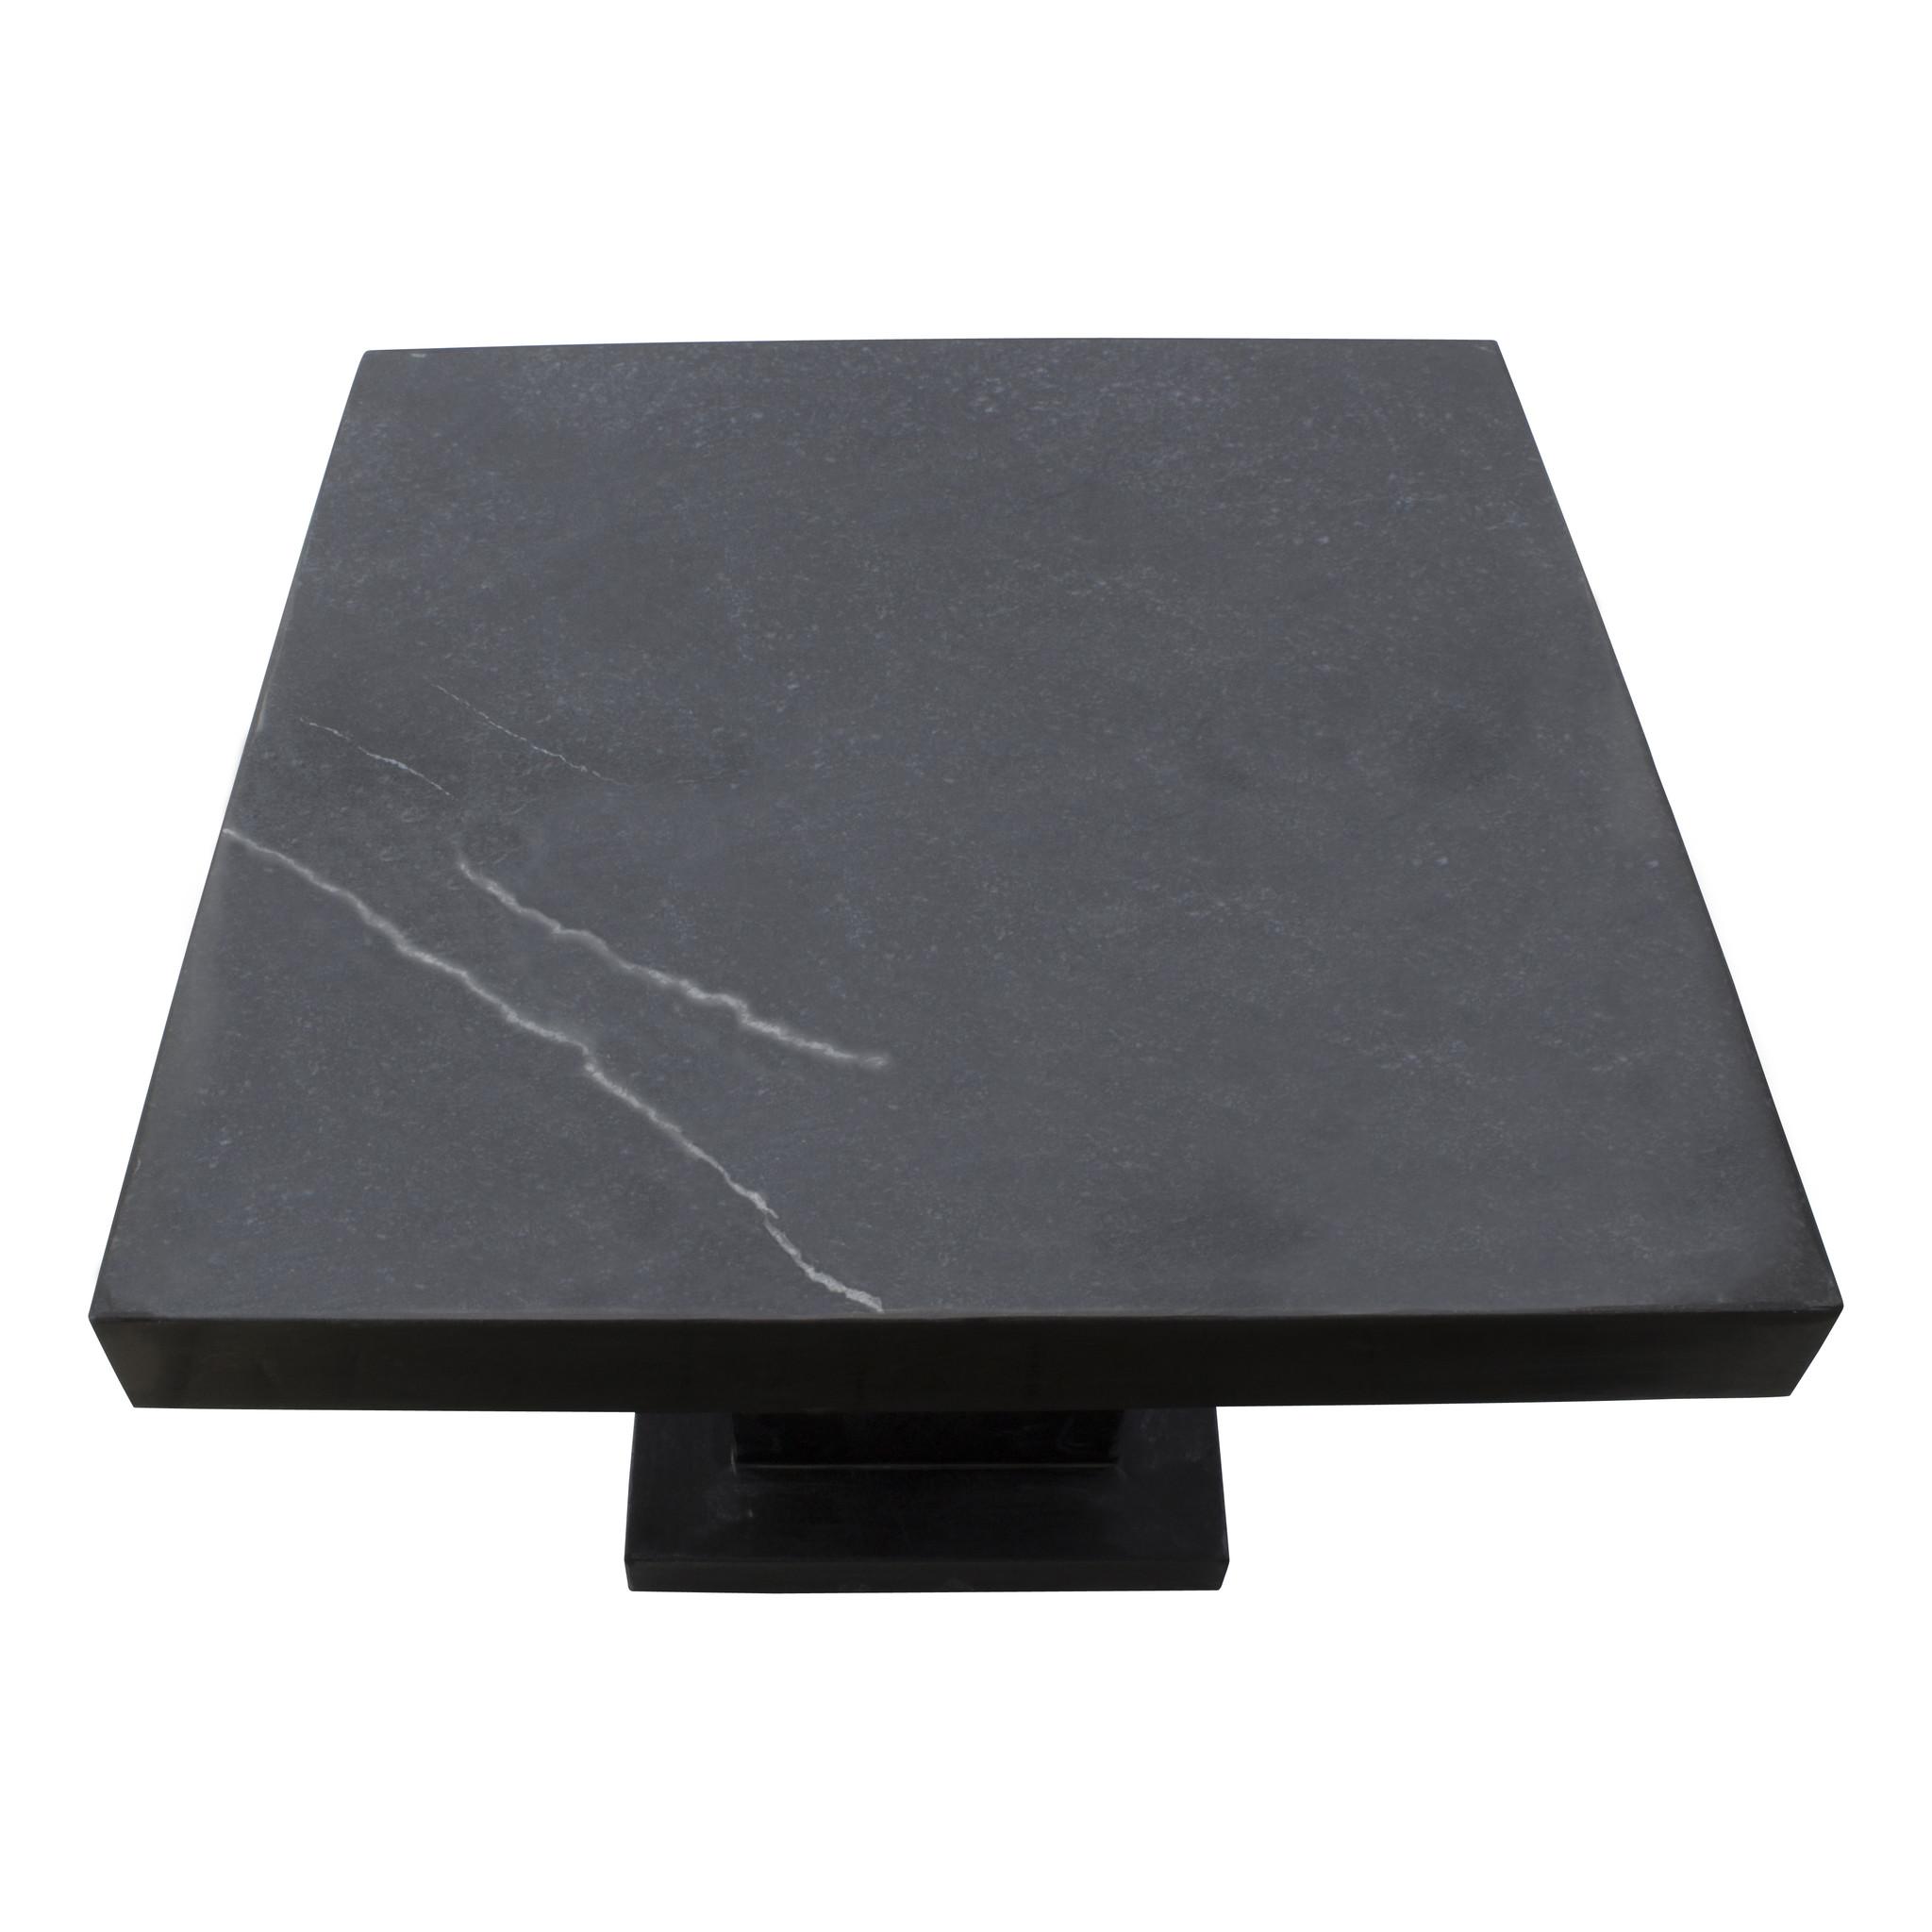 Indomarmer Bijzettafel Vierkant 50x50x40 cm Zwart Marmer